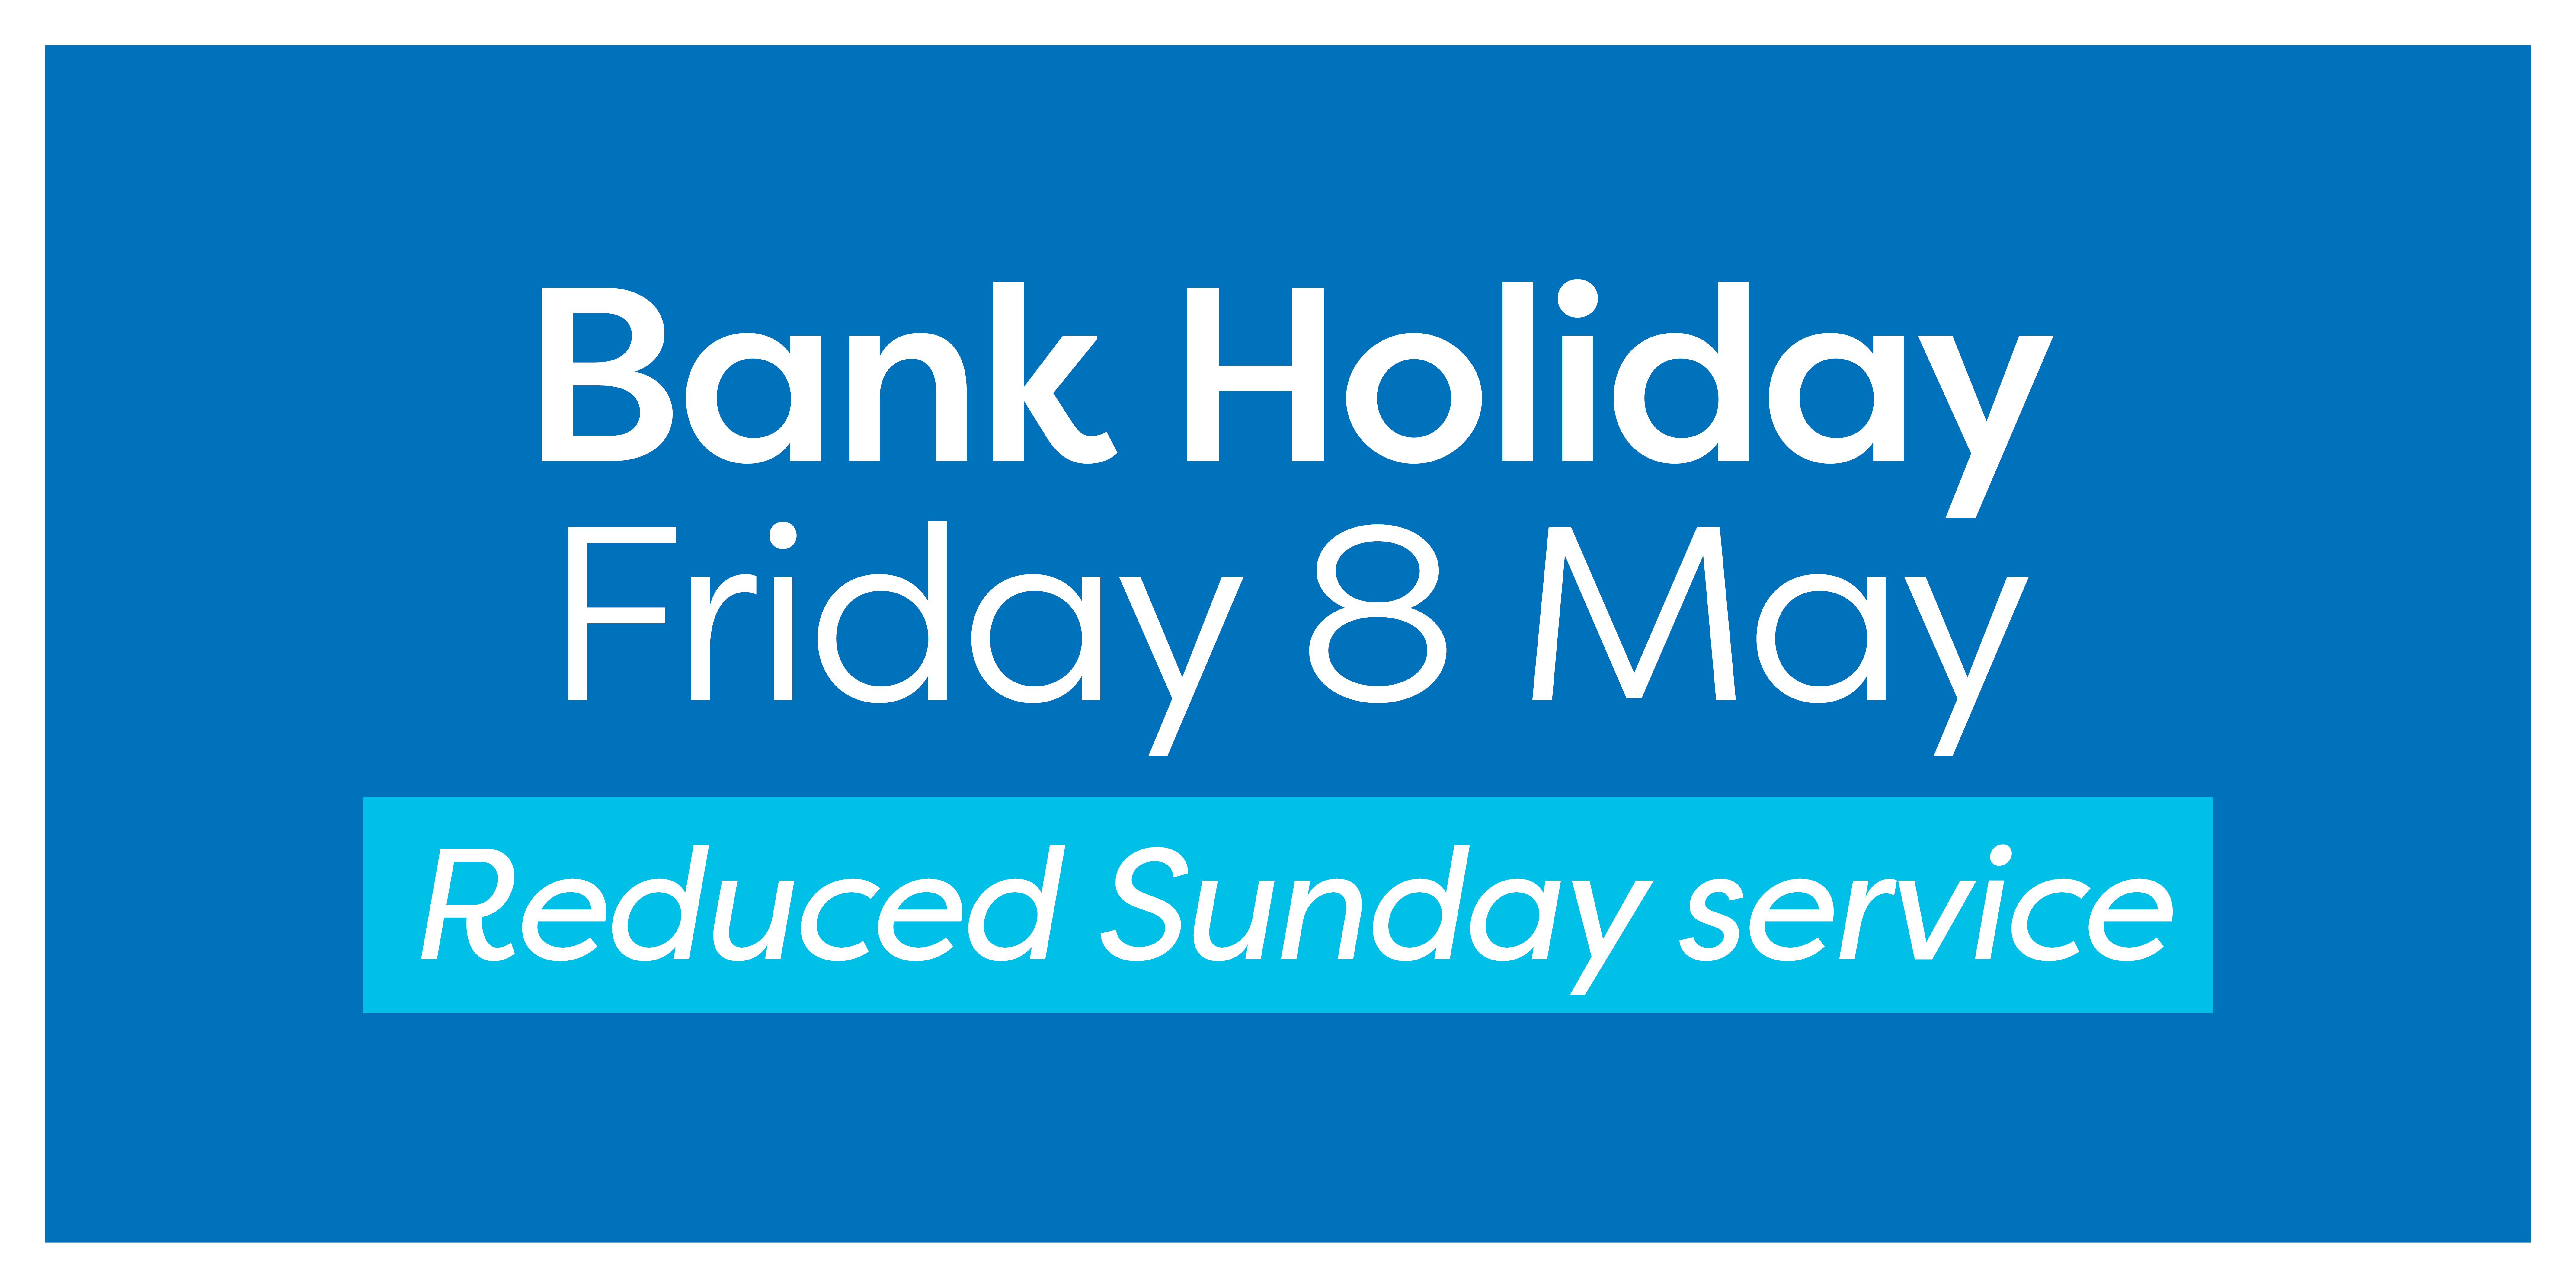 Image reading 'Bank Holiday - Friday 8th May - Reduced Sunday service'